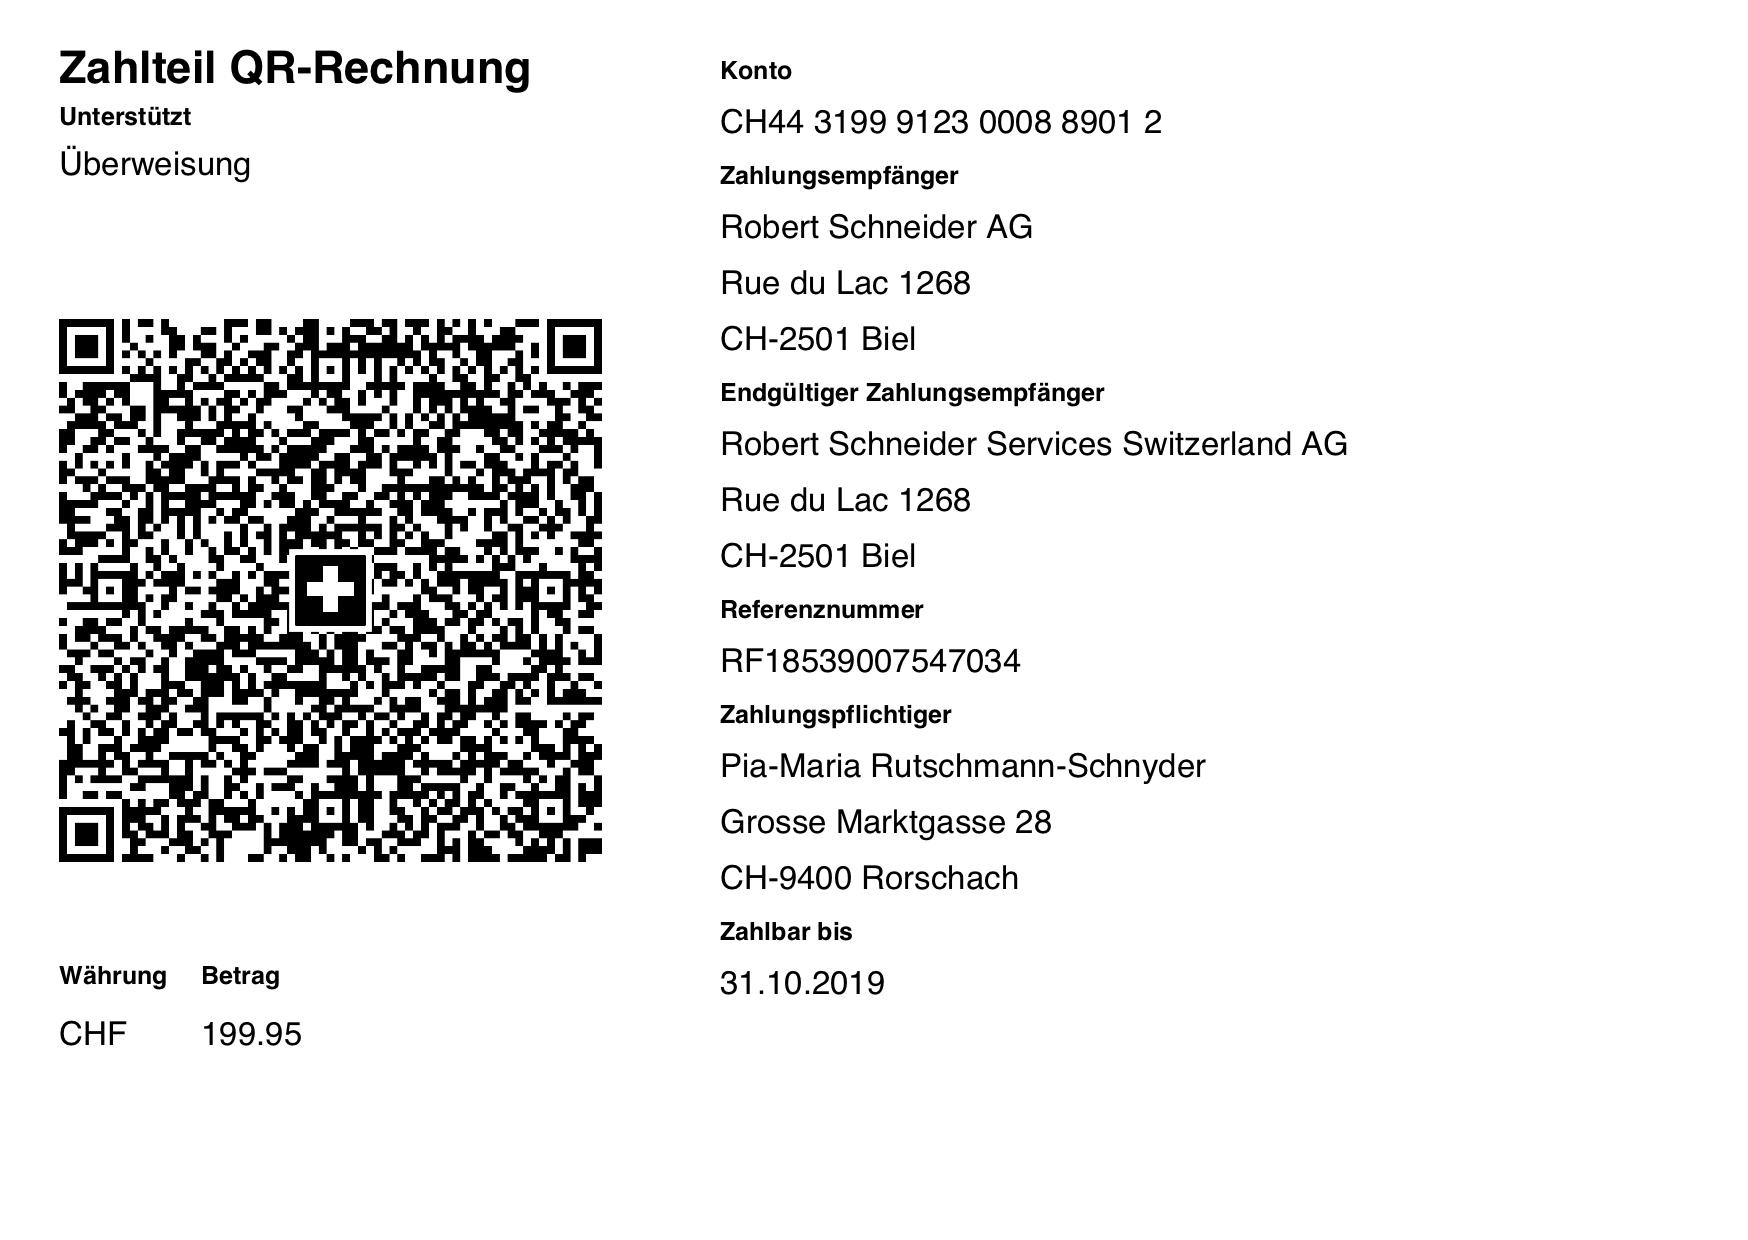 ISO-20022 QR Code Rechnung mit Creditor Reference Referenznummer